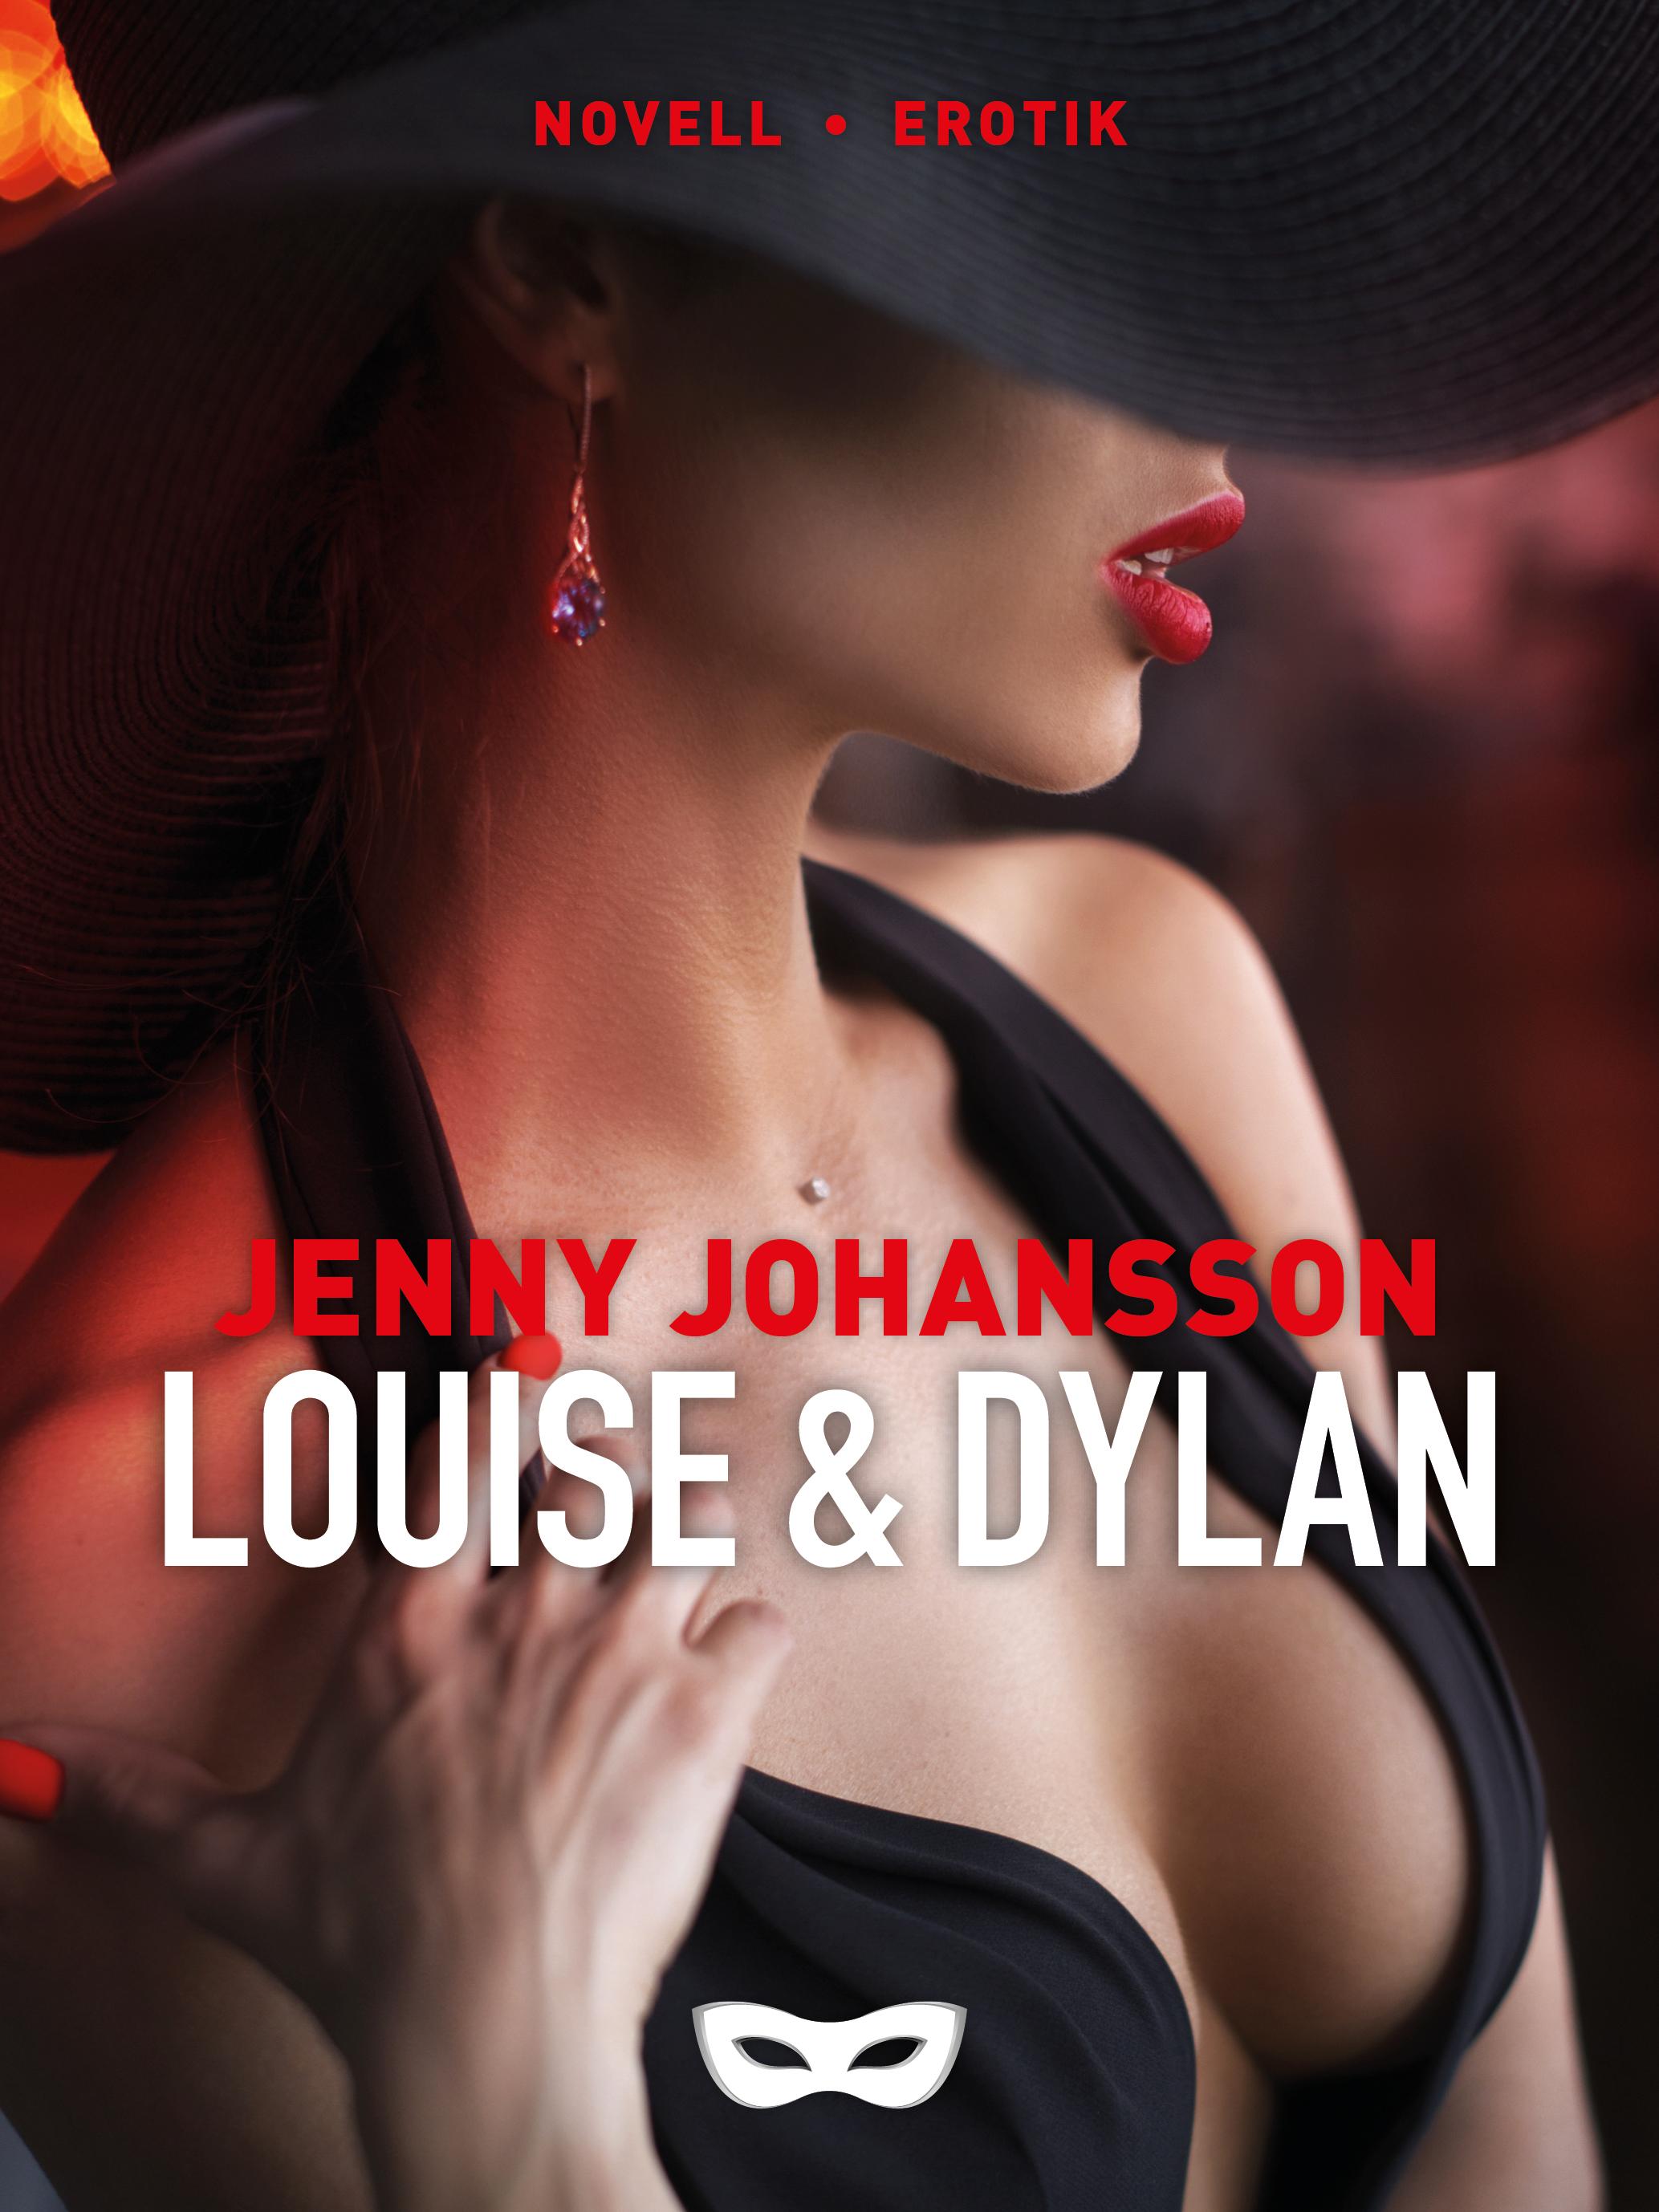 LOUISE3-n_Louise & Dylan_Jenny Johansson.jpg